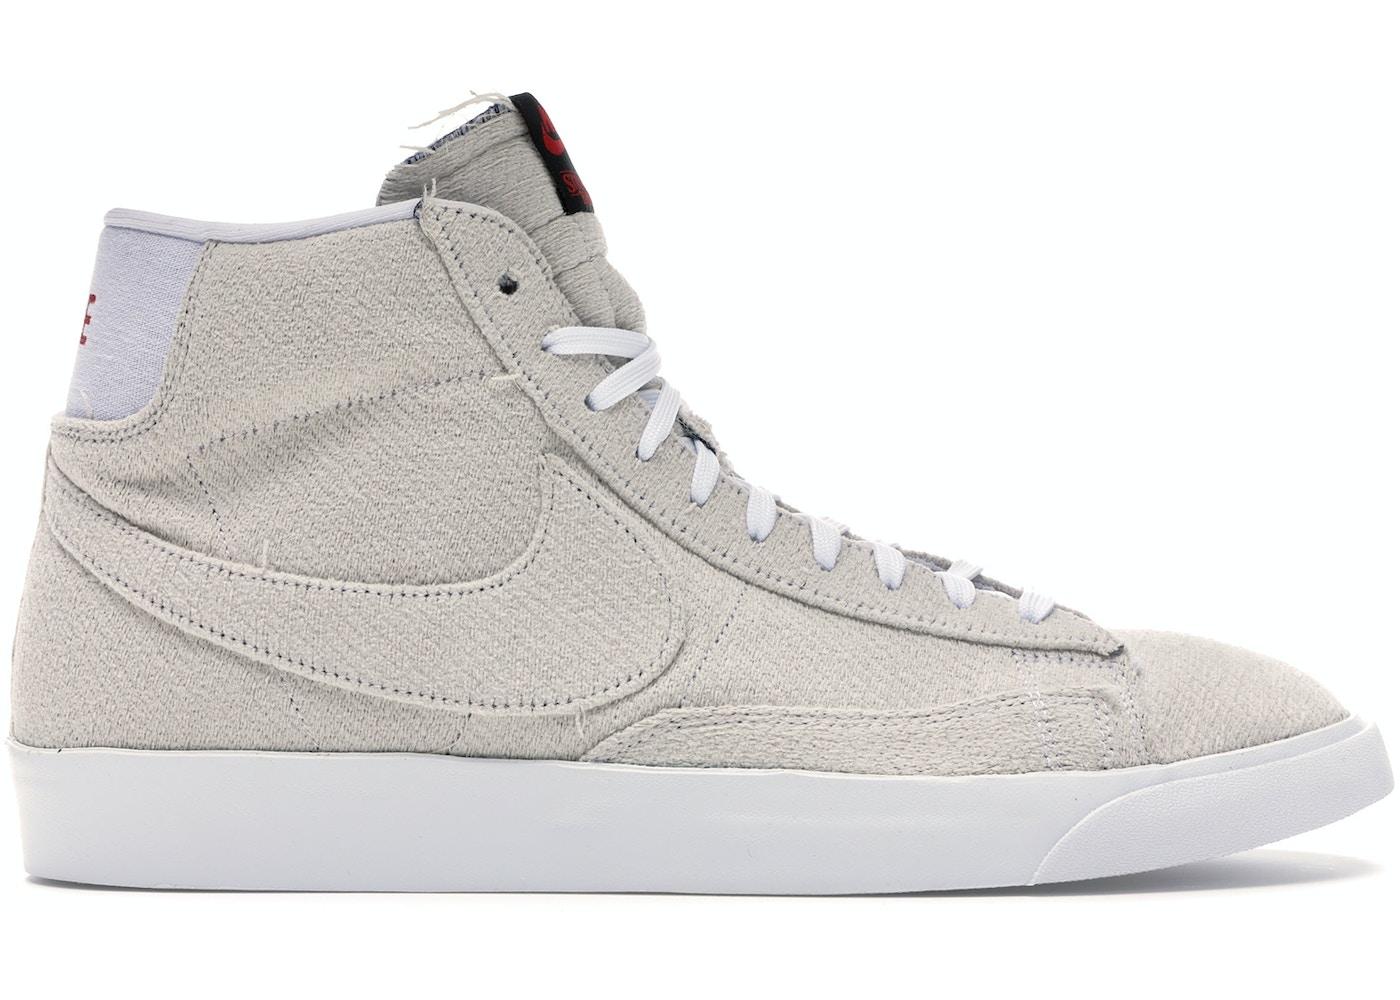 factible escala Realmente  Nike Blazer Mid Strangers Things Upside Down Pack - CJ6102-100